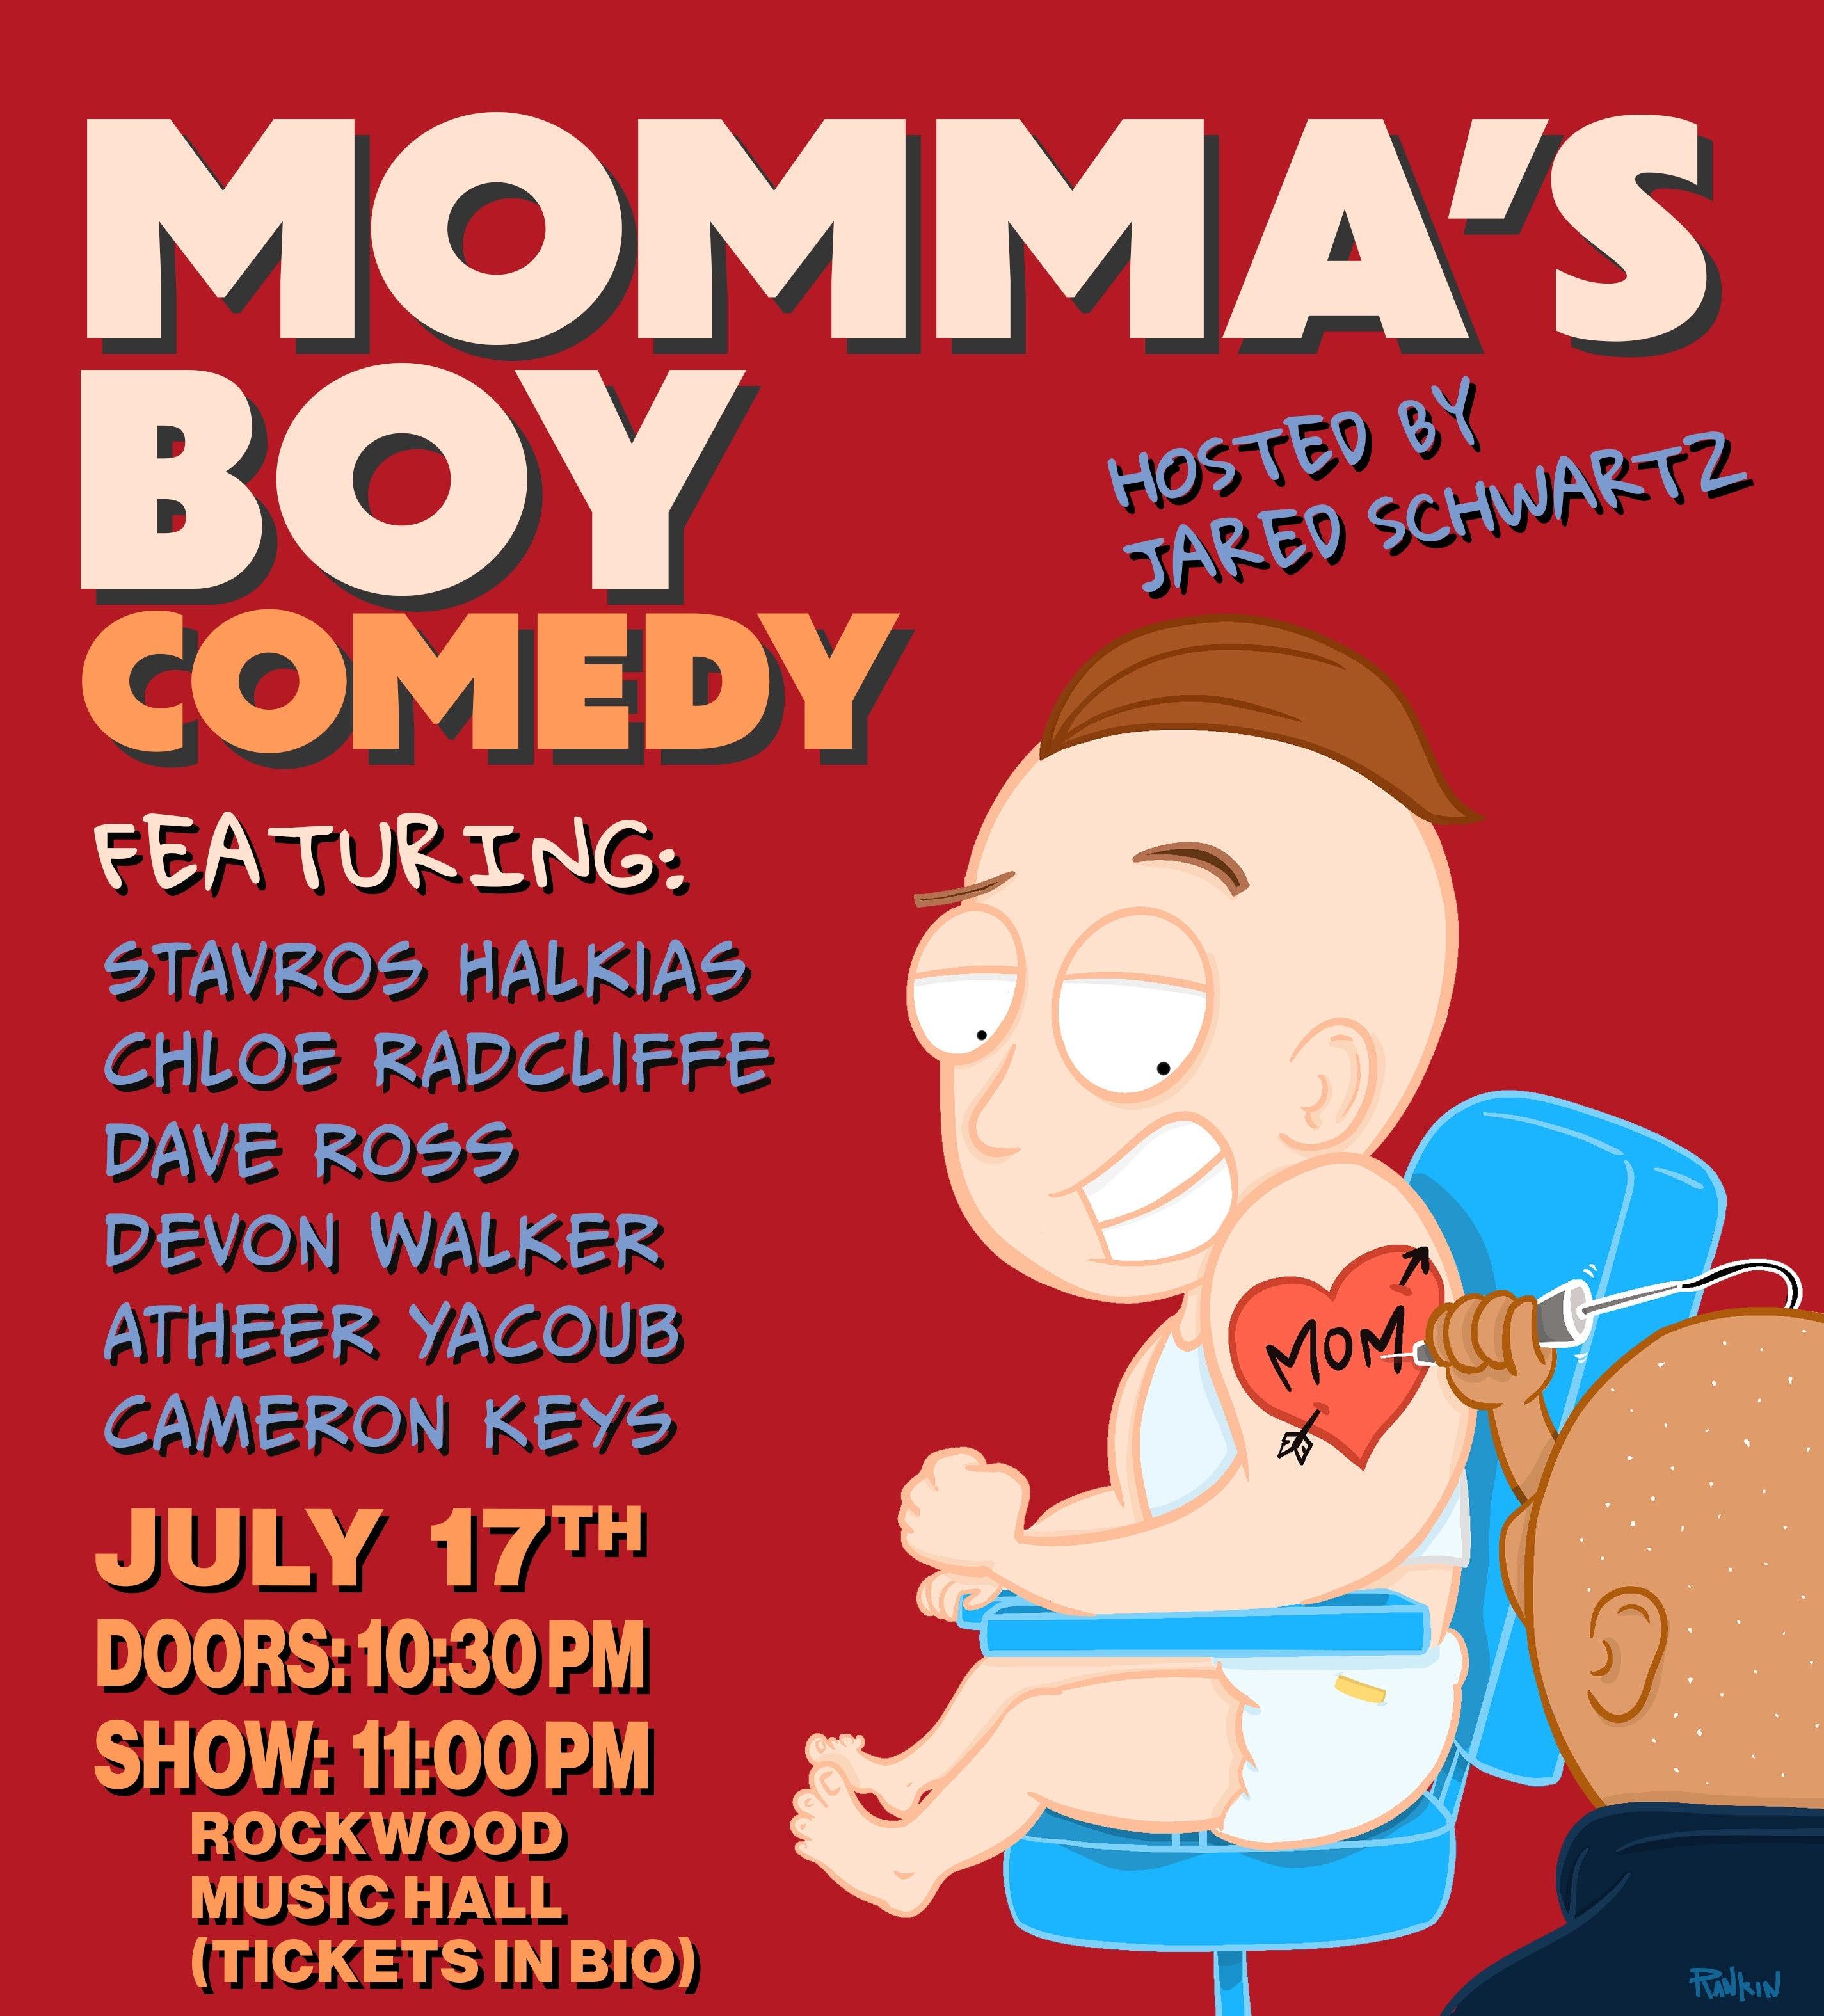 Momma's Boy Comedy: